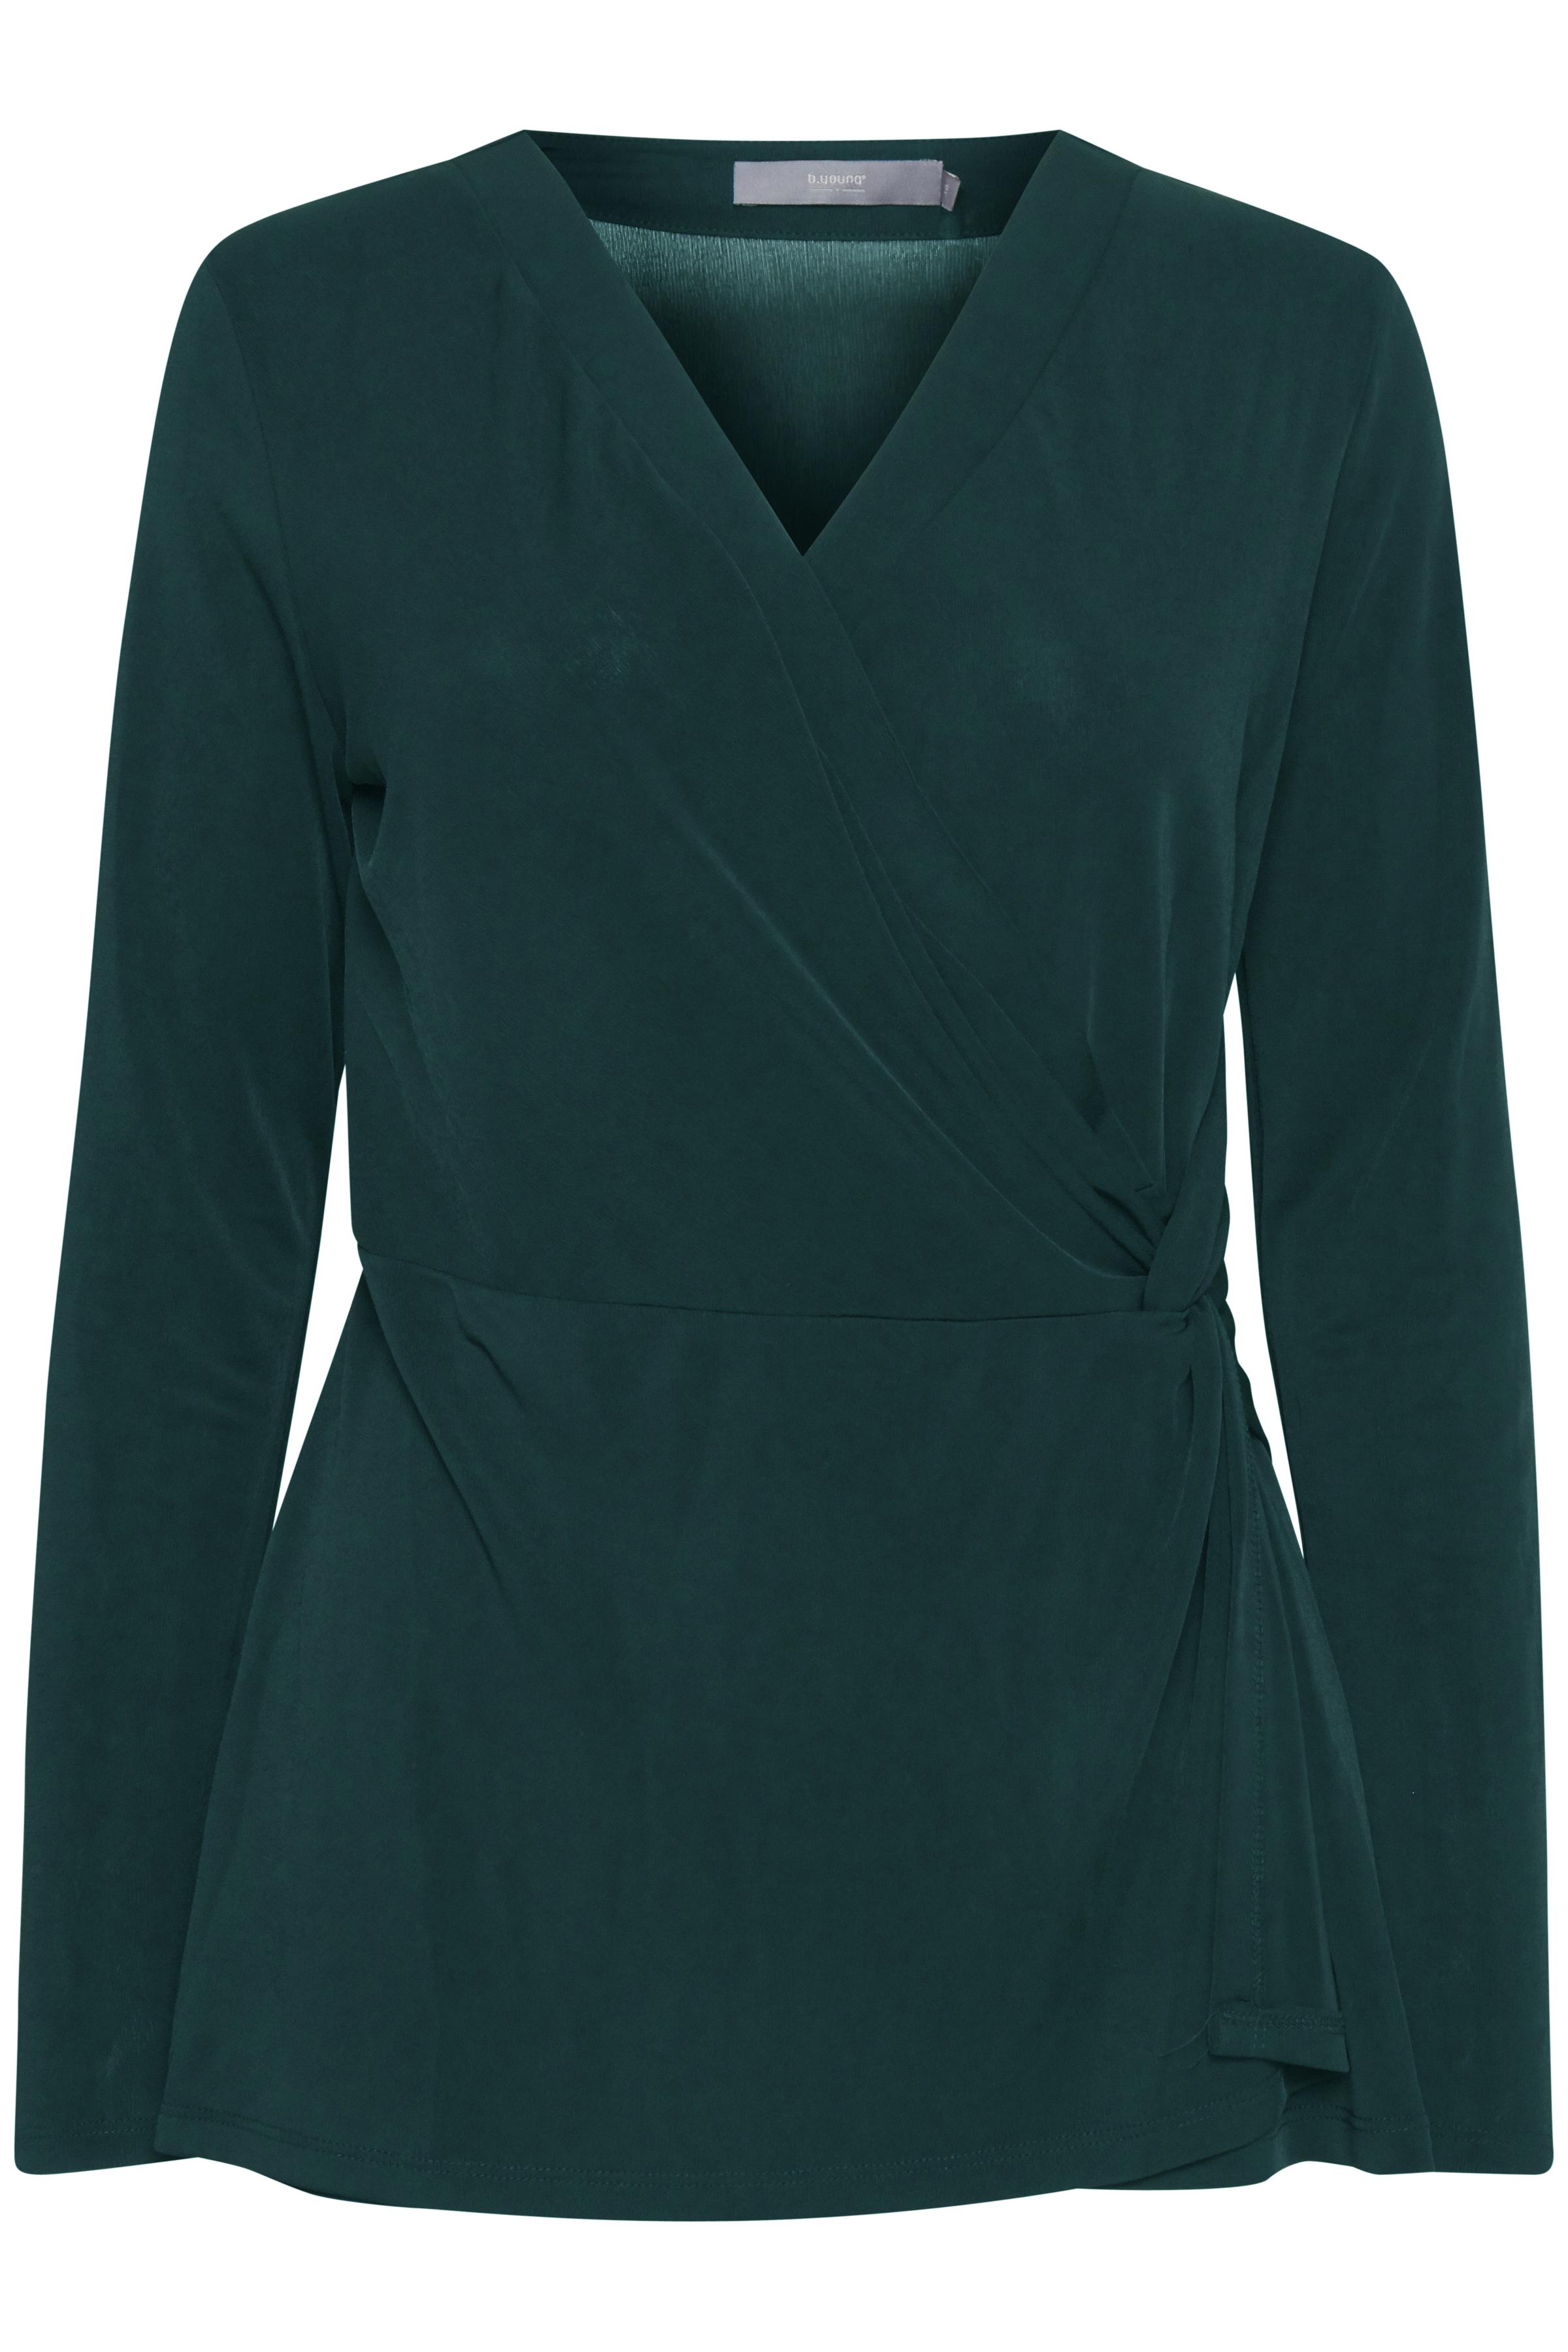 Majestic Green Langærmet T-shirt fra b.young – Køb Majestic Green Langærmet T-shirt fra str. XS-XL her